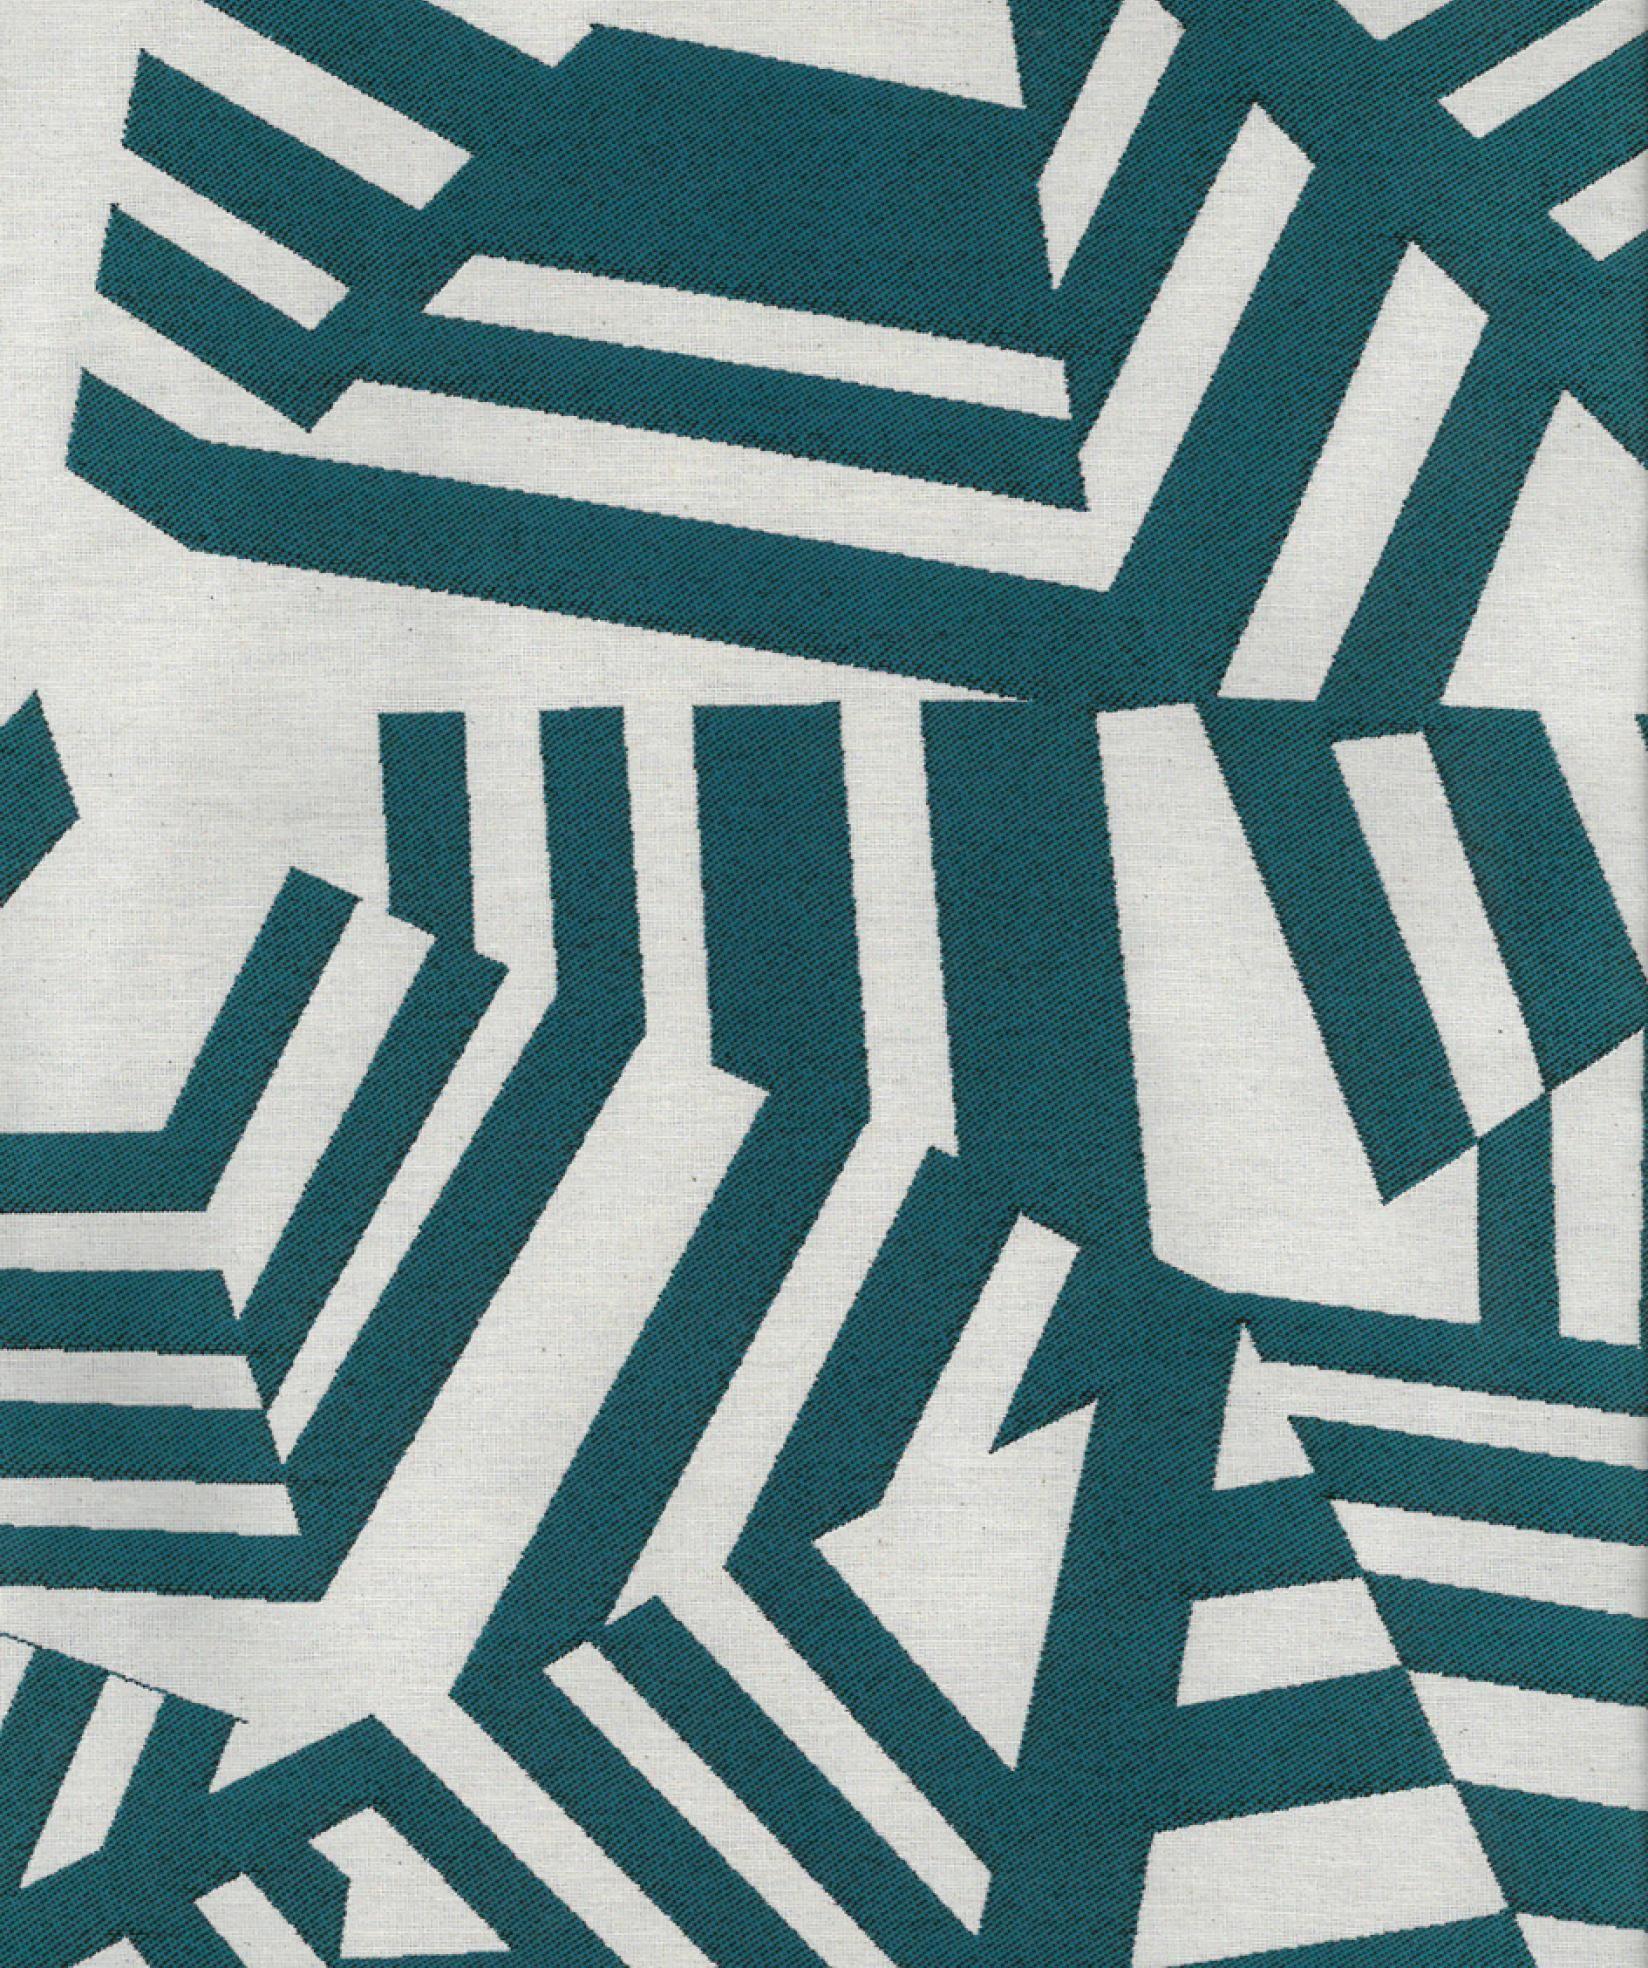 tissu banquette | fabrics and wallpaper | pinterest | banquette